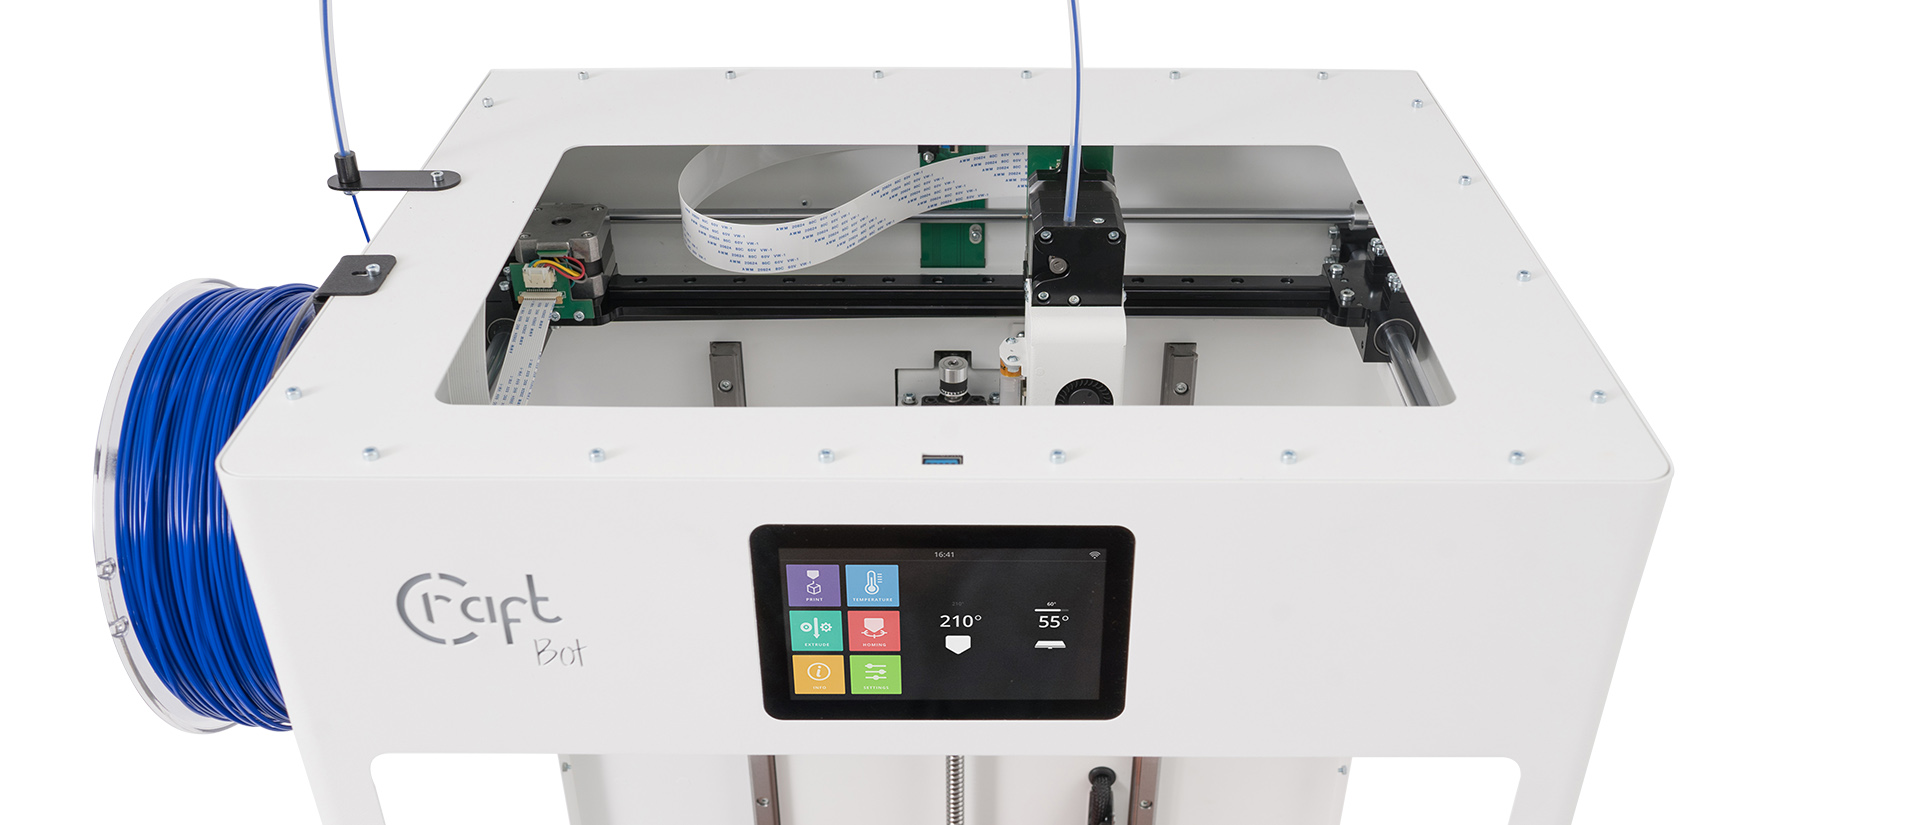 A CraftBot Flow single extruder 3D printer. Photo via CraftUnique.